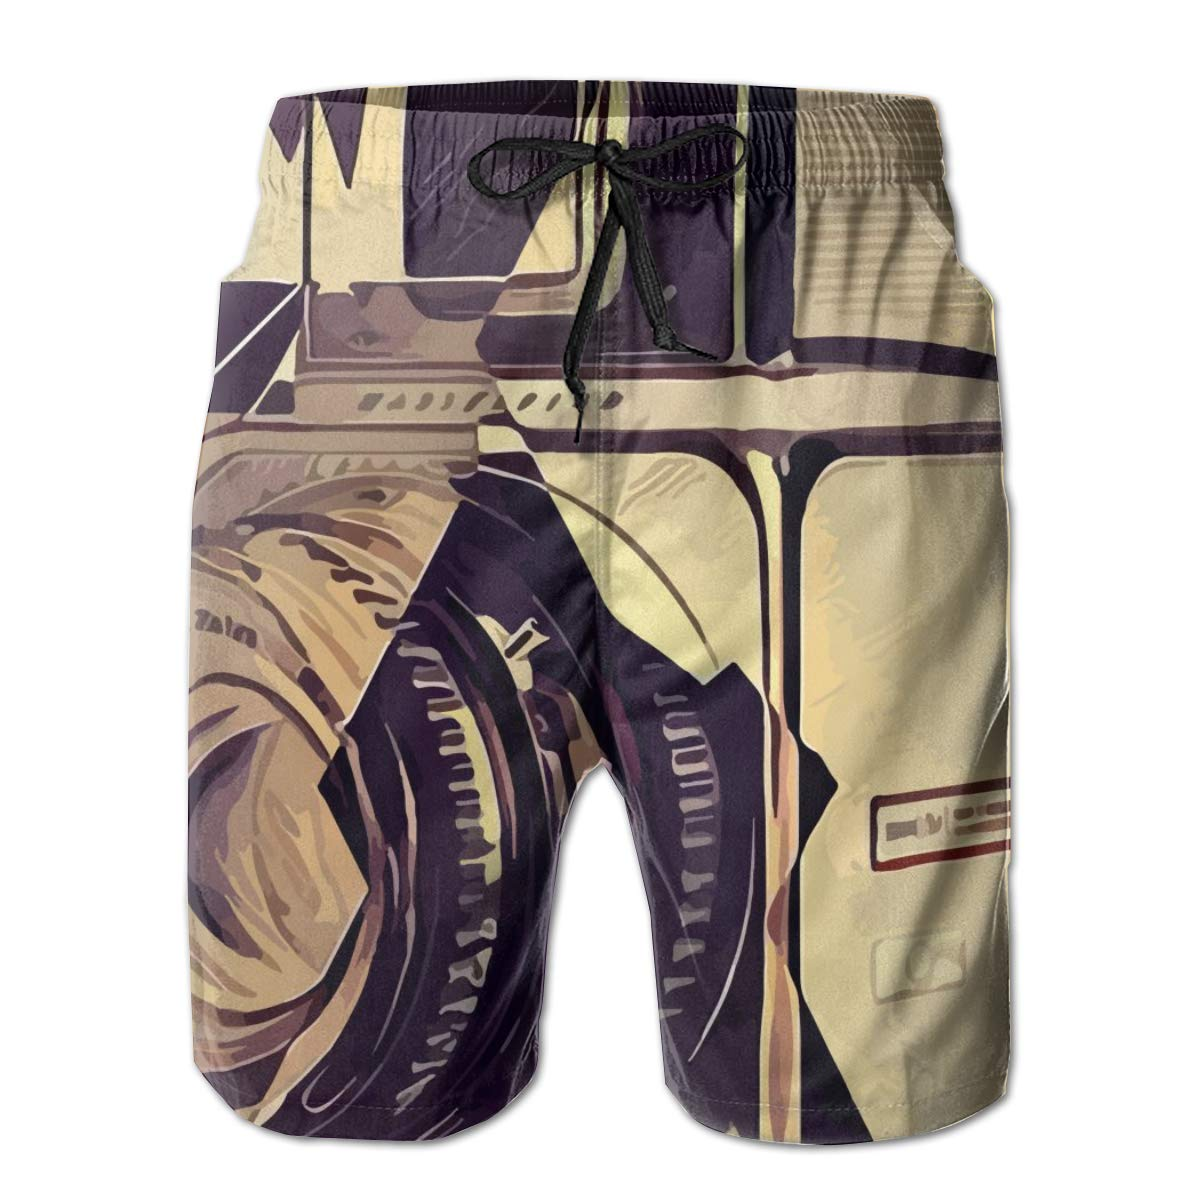 HZamora/_H Men SLR Camera Summer Breathable Quick-Drying Swim Trunks Beach Shorts Board Shorts